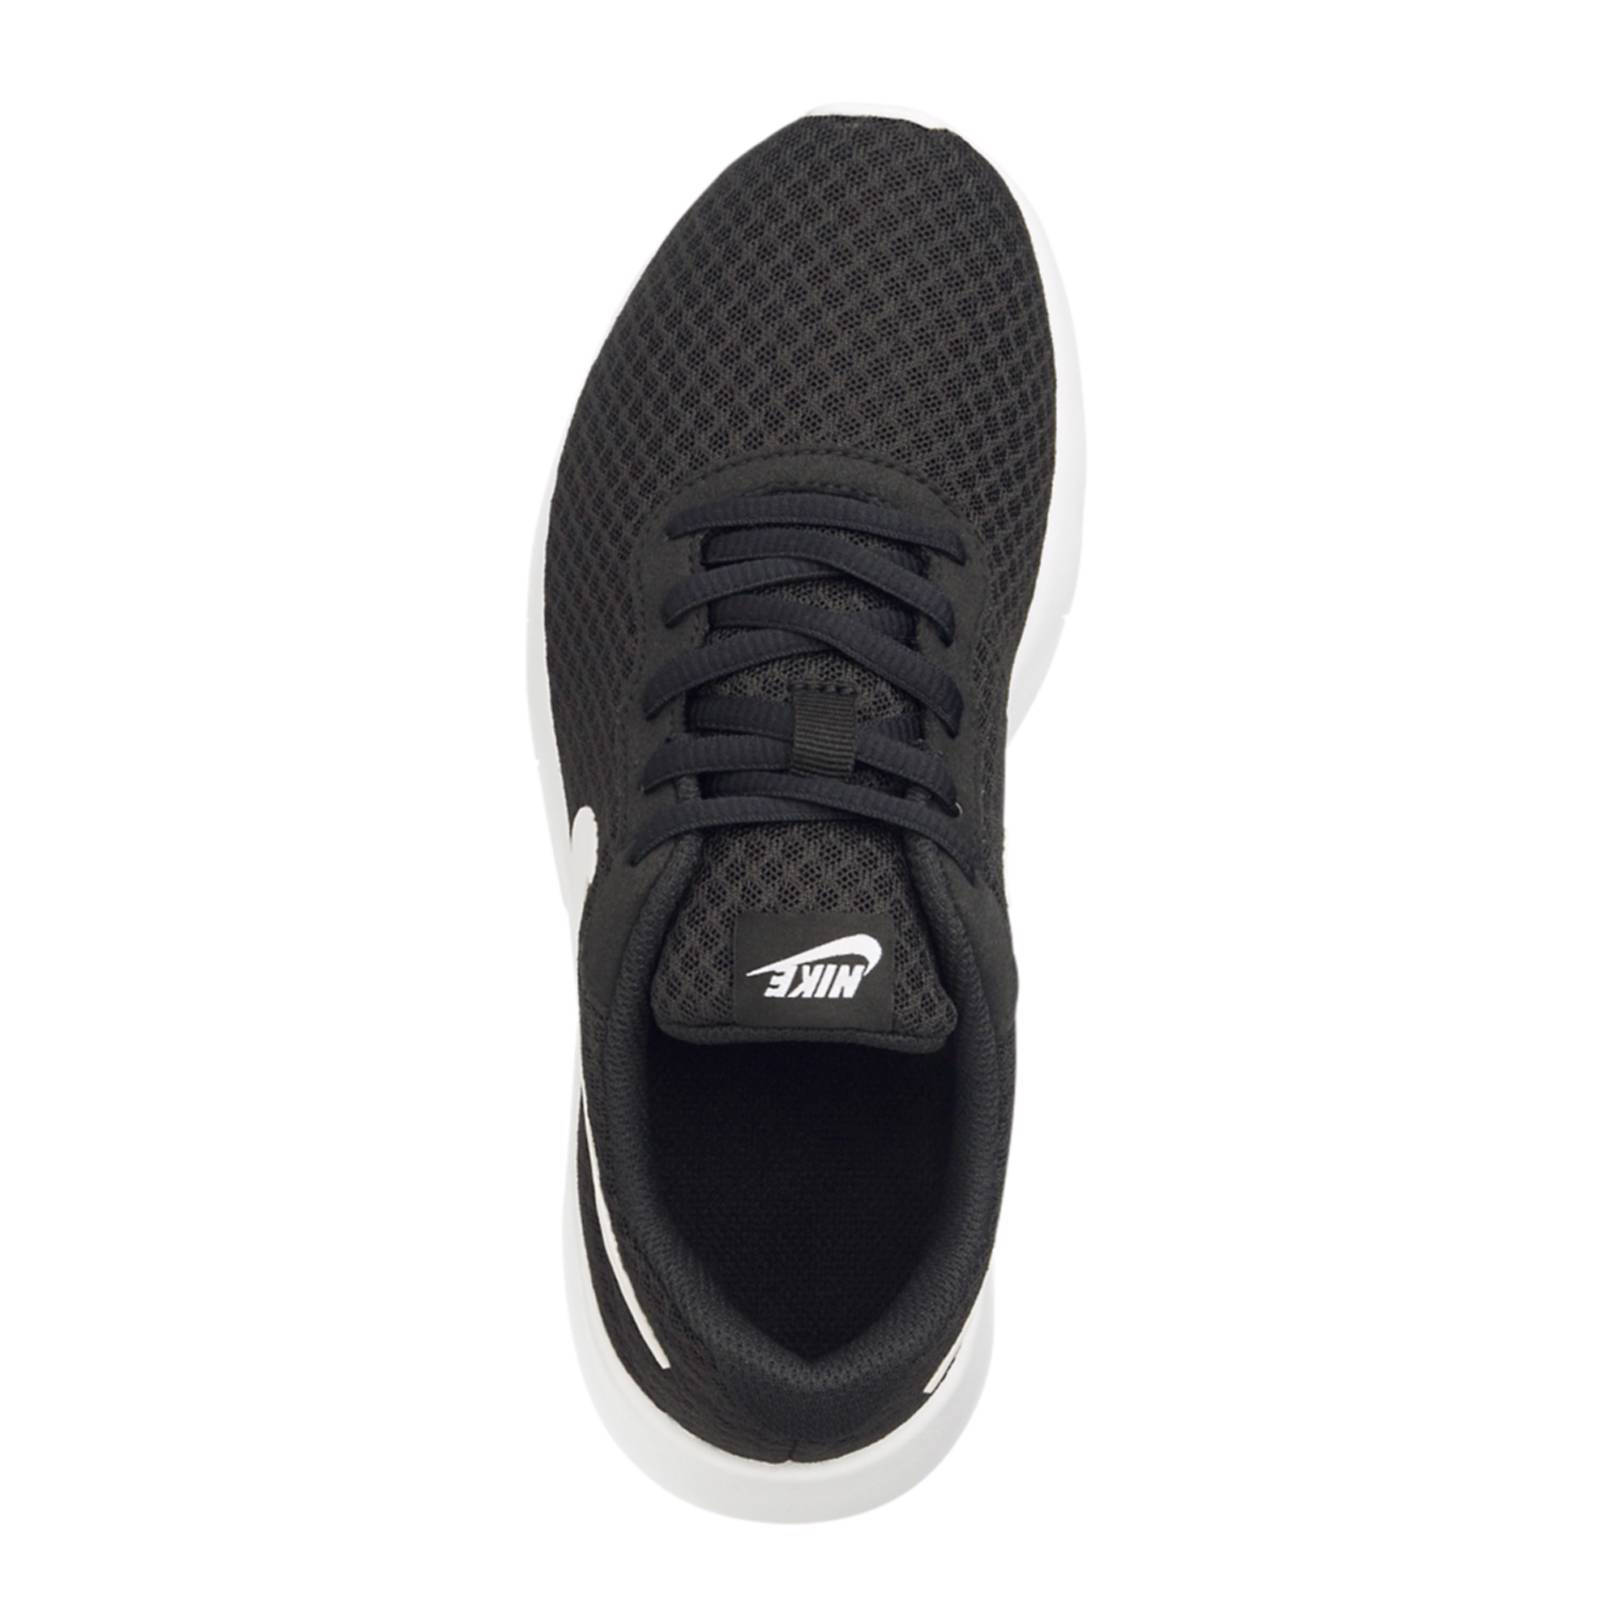 competitive price 76faf 31b8d nike-tanjun-sneakers-zwart.jpg